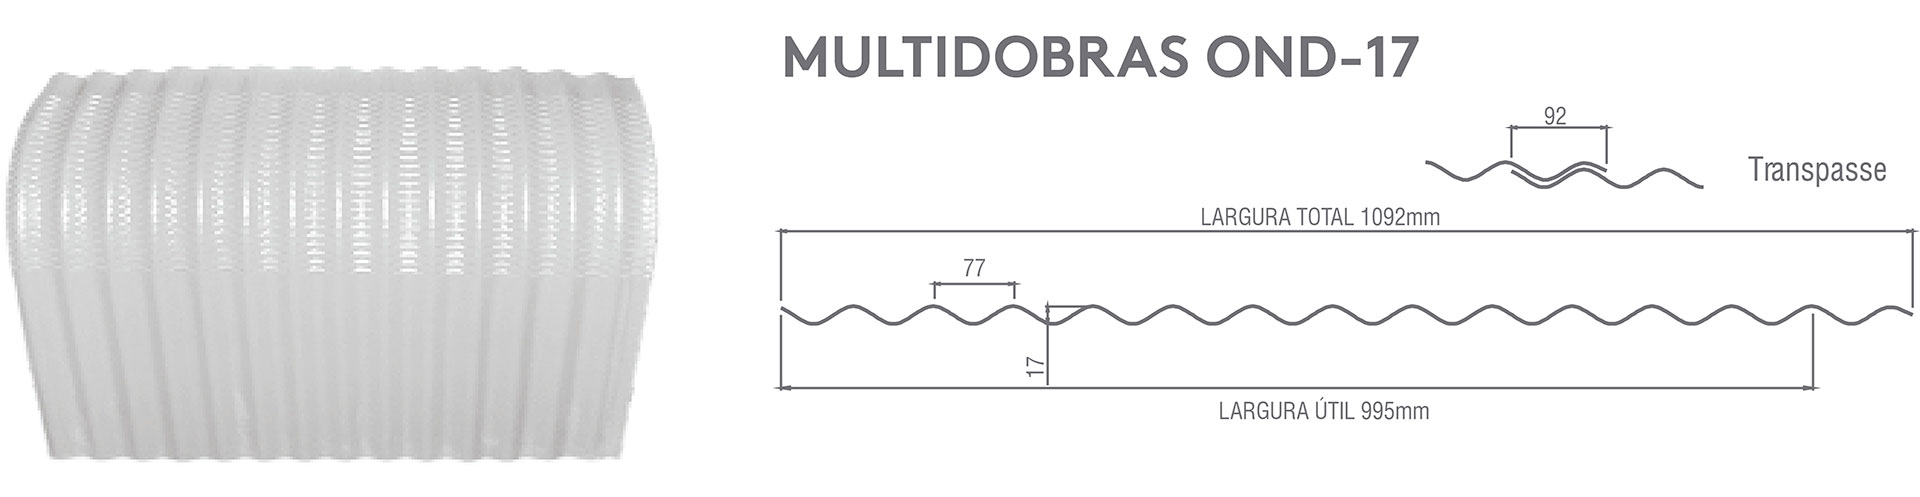 multidobras-ond-17